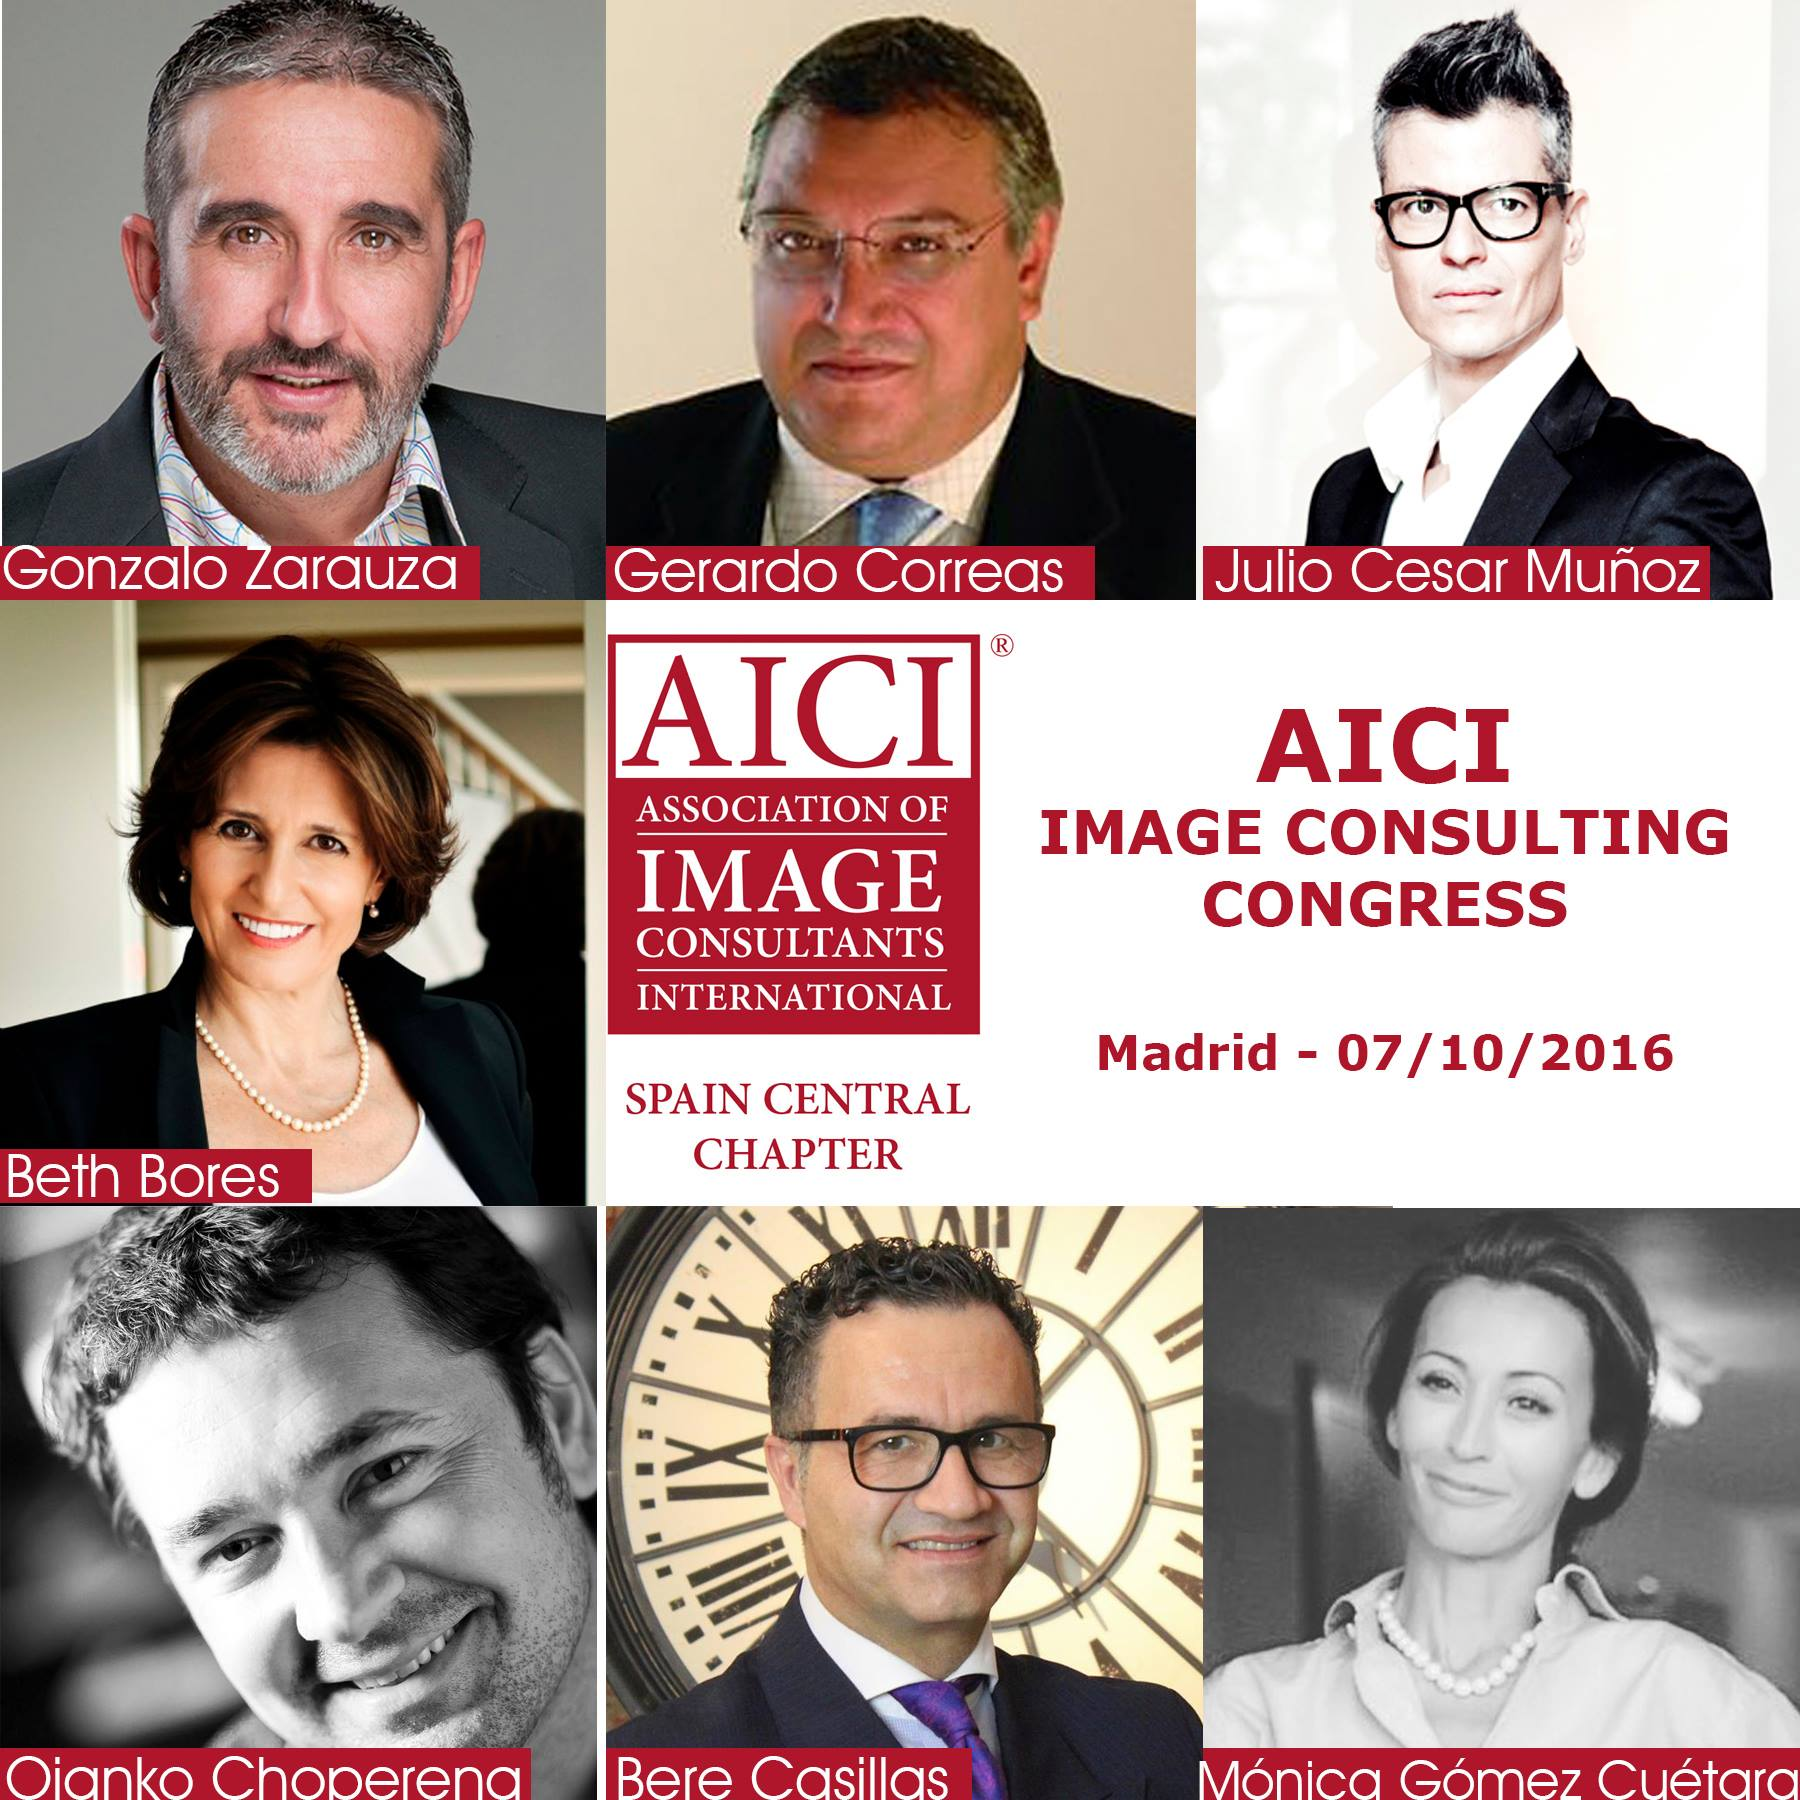 The Image Consulting Congress 2016celebró con éxito su segunda edición en Madrid